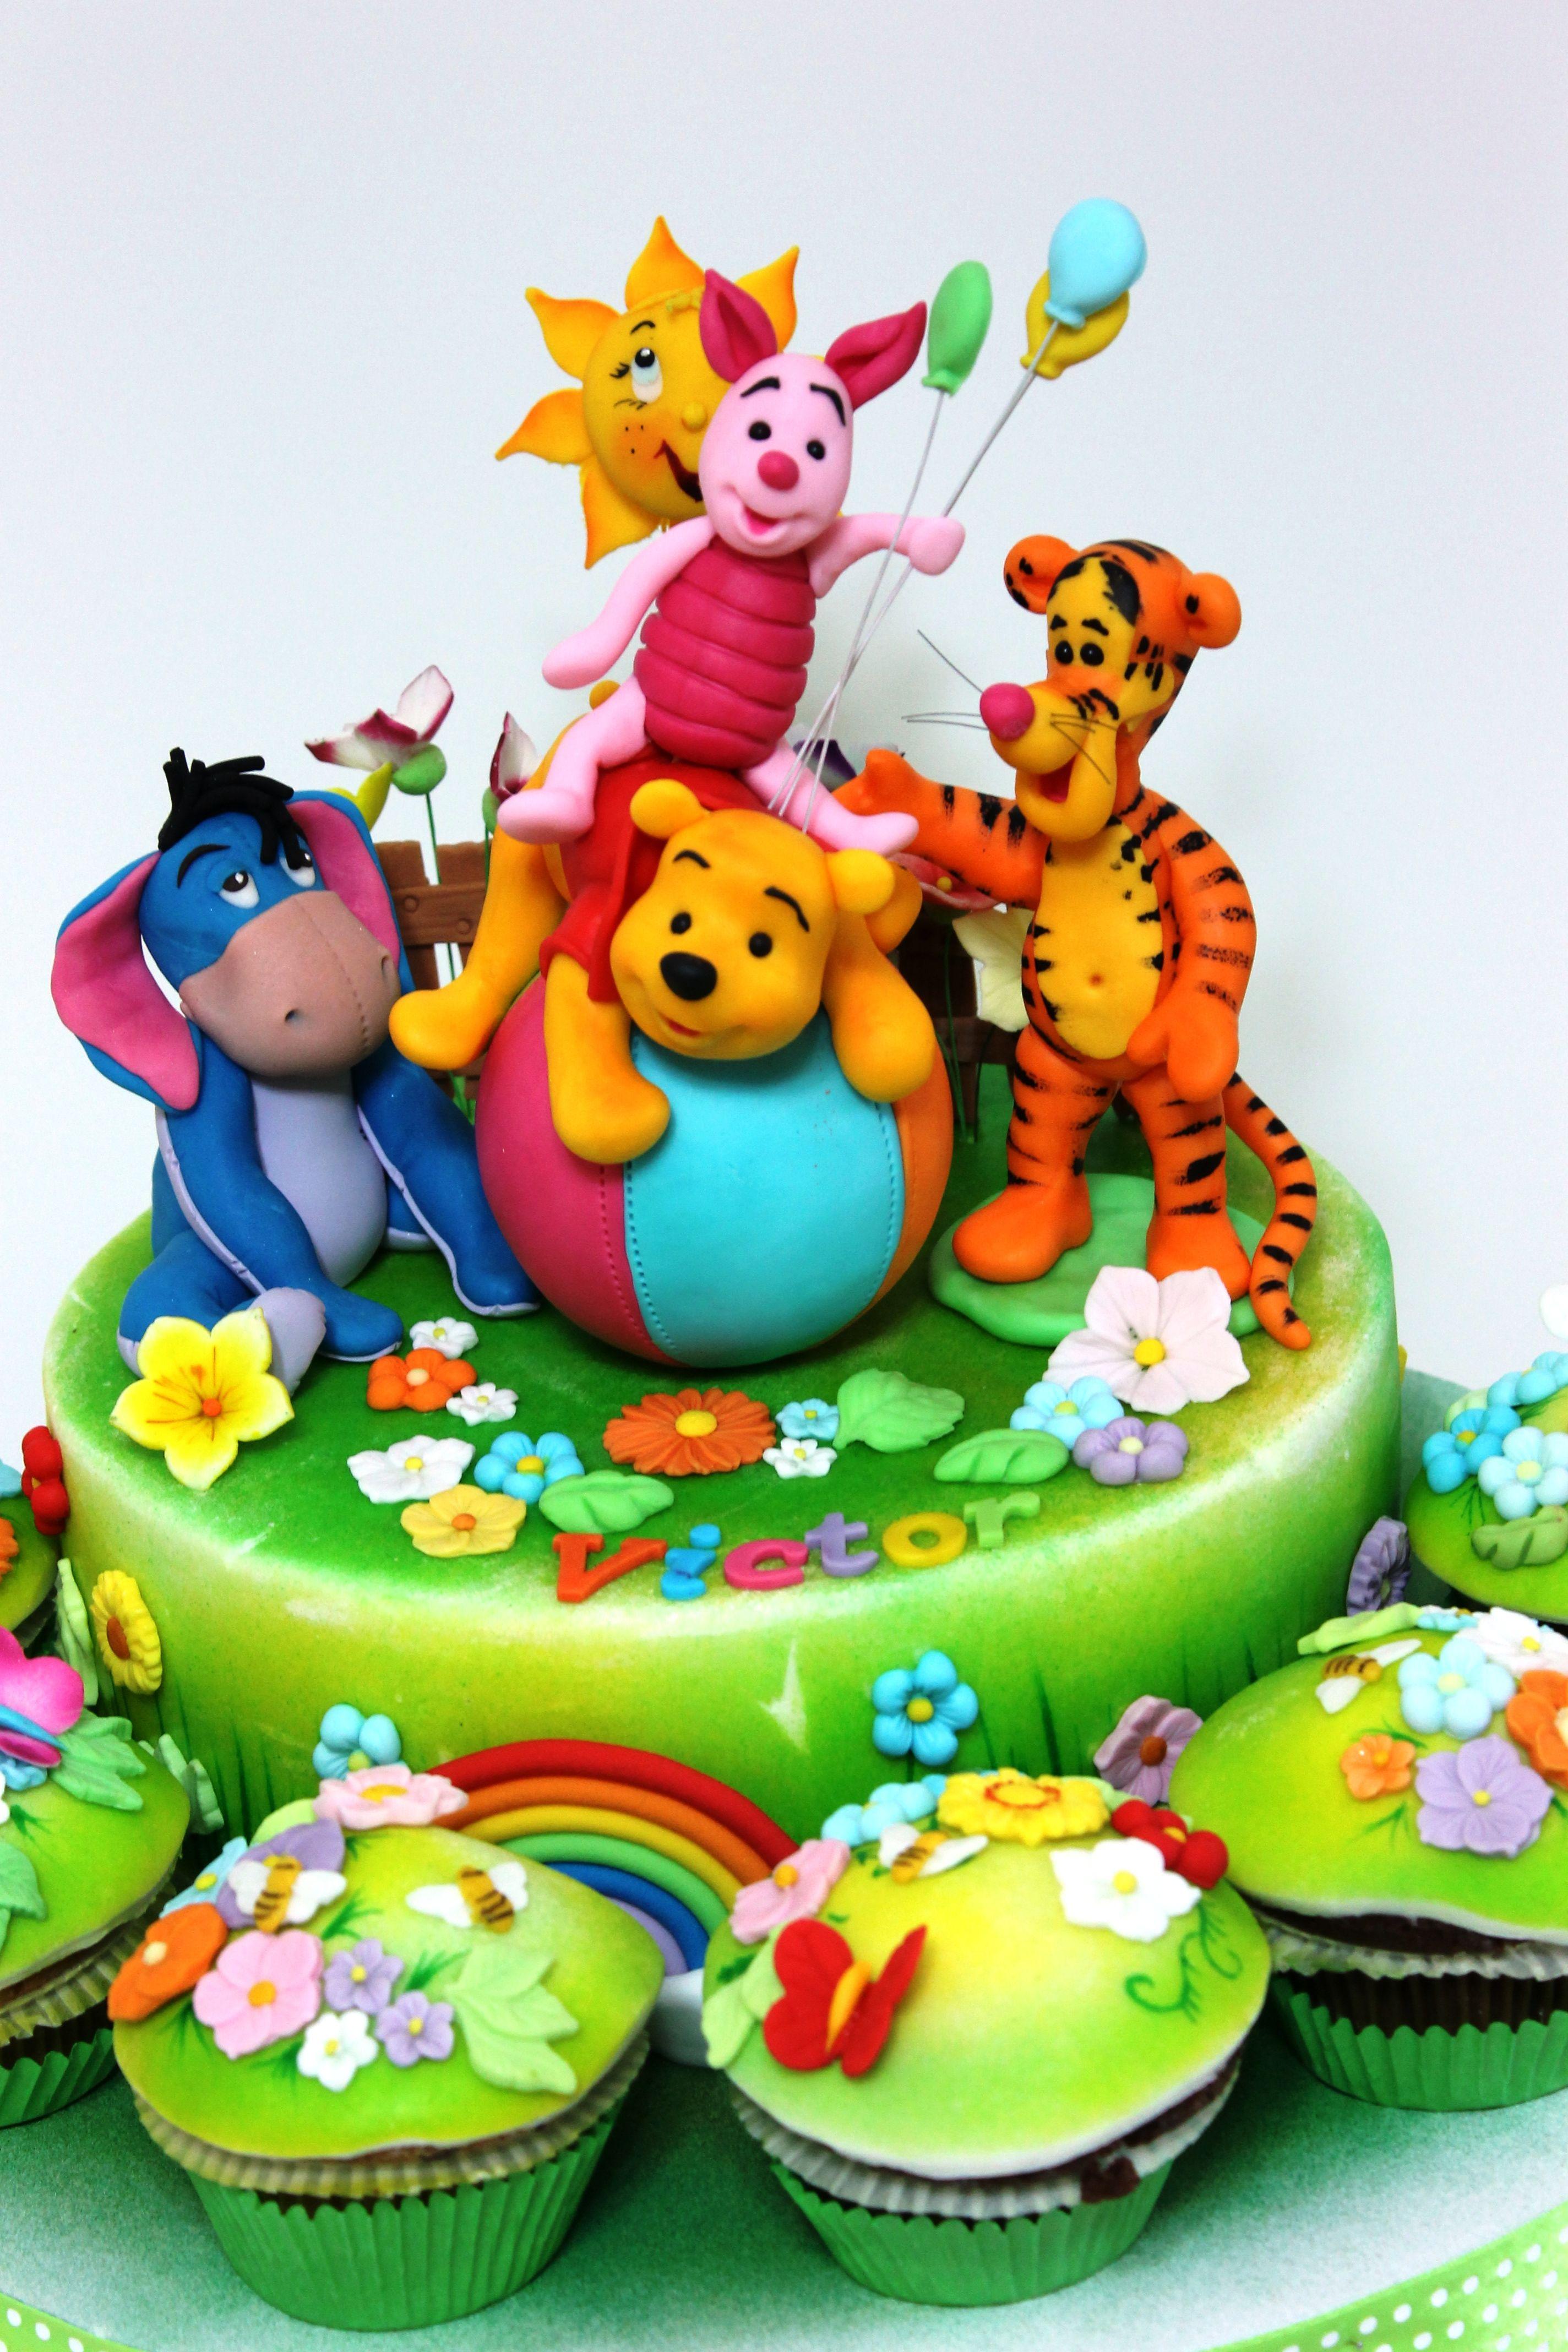 Most wonderful winnie the pooh friends cake cupcakes